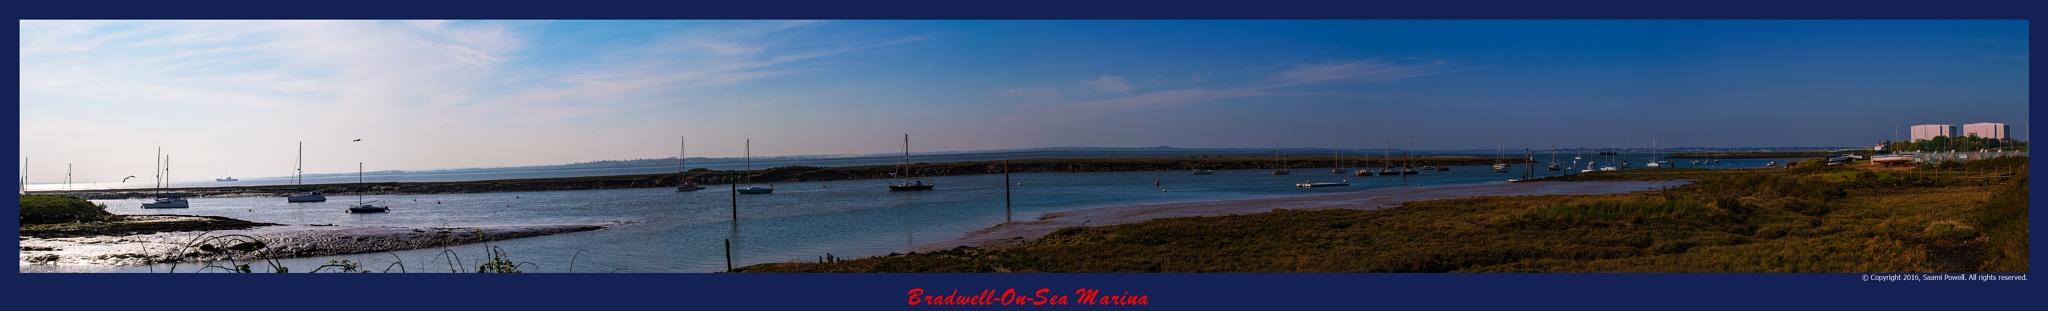 Bradwell On Sea Marina Panorama by Saami Powell